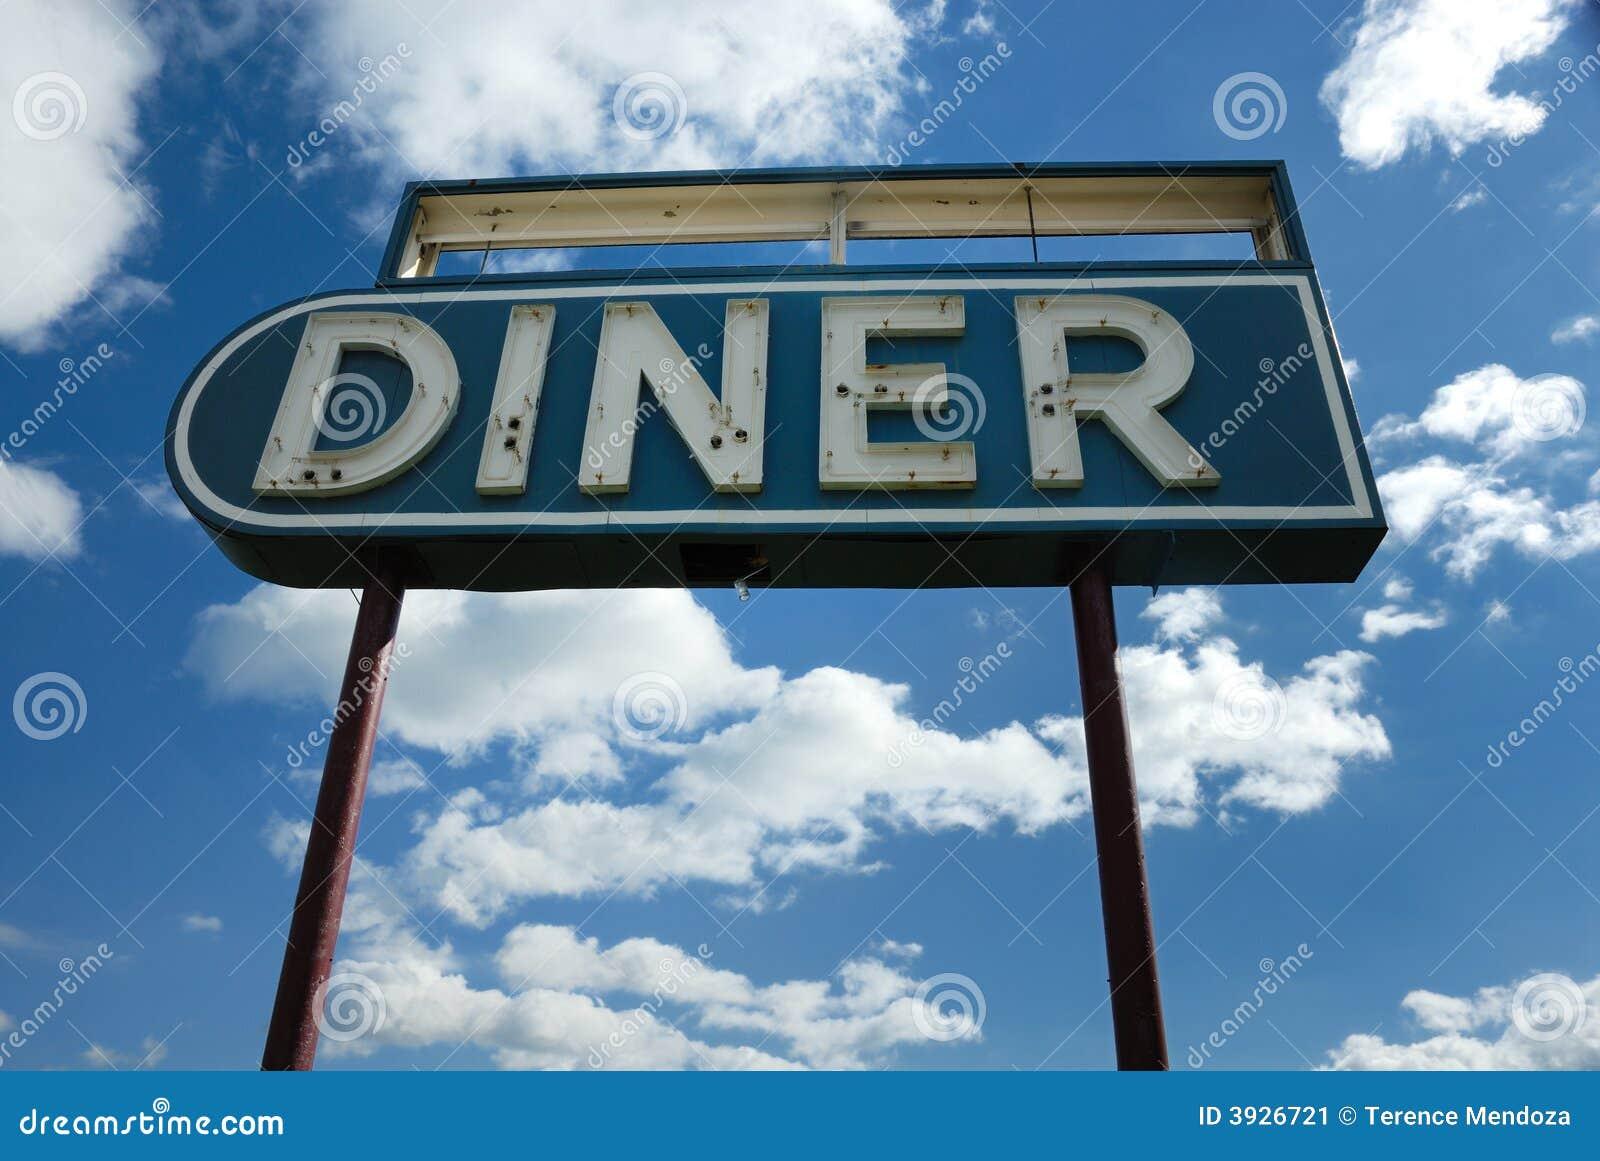 Retro Diner Sign Stock Image Of Memorabilia